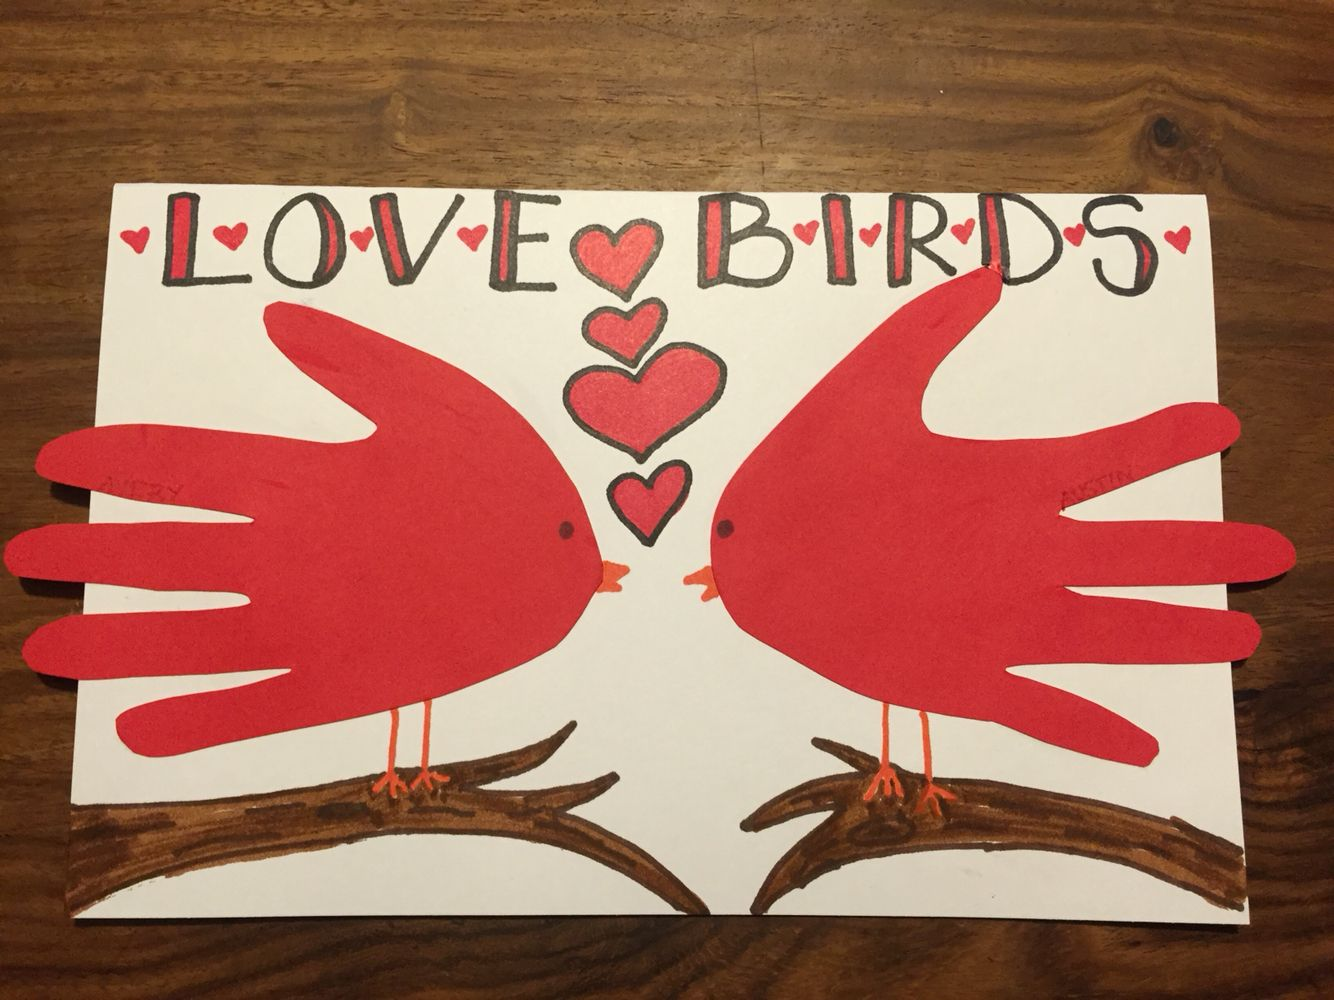 Lovebirds handprint birds valentine 39 s day or anniversary for Anniversary craft ideas for parents